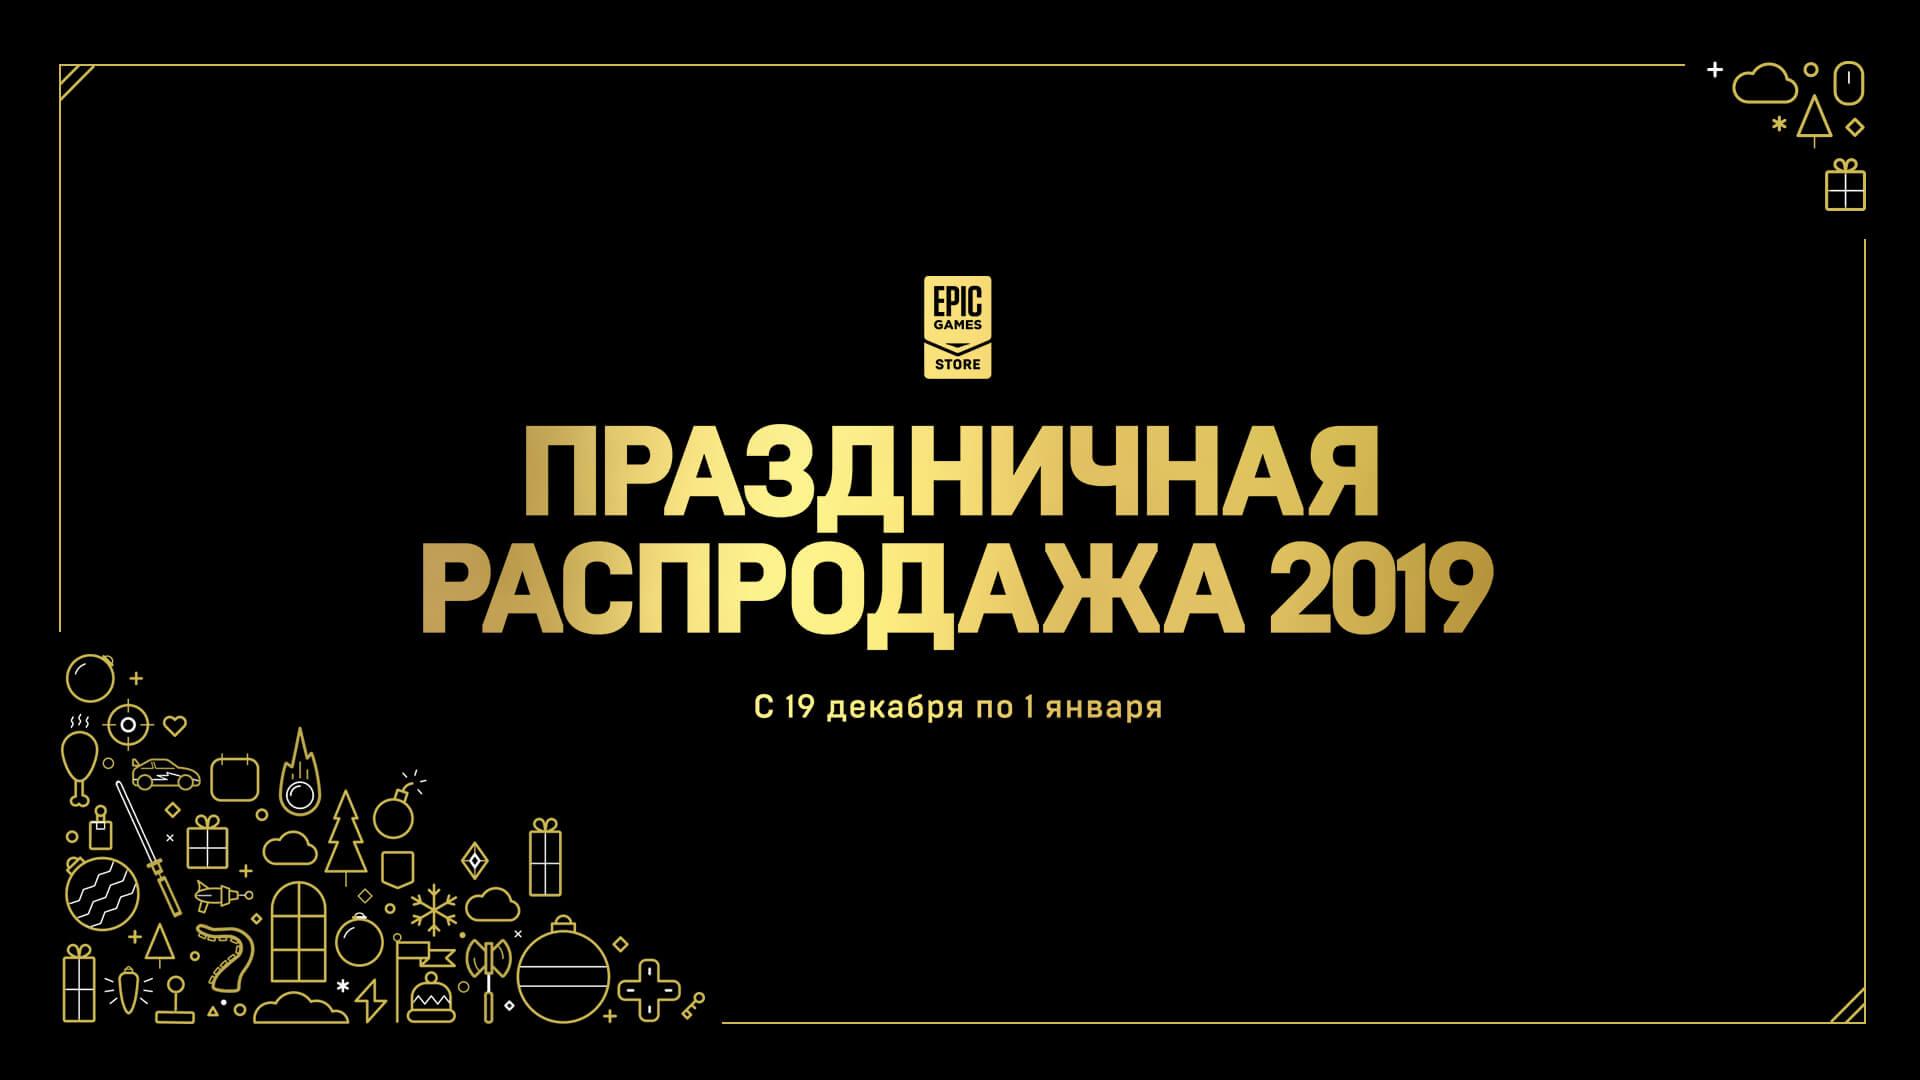 Распродажа сайт на русском автокресло nania cosmo sp access